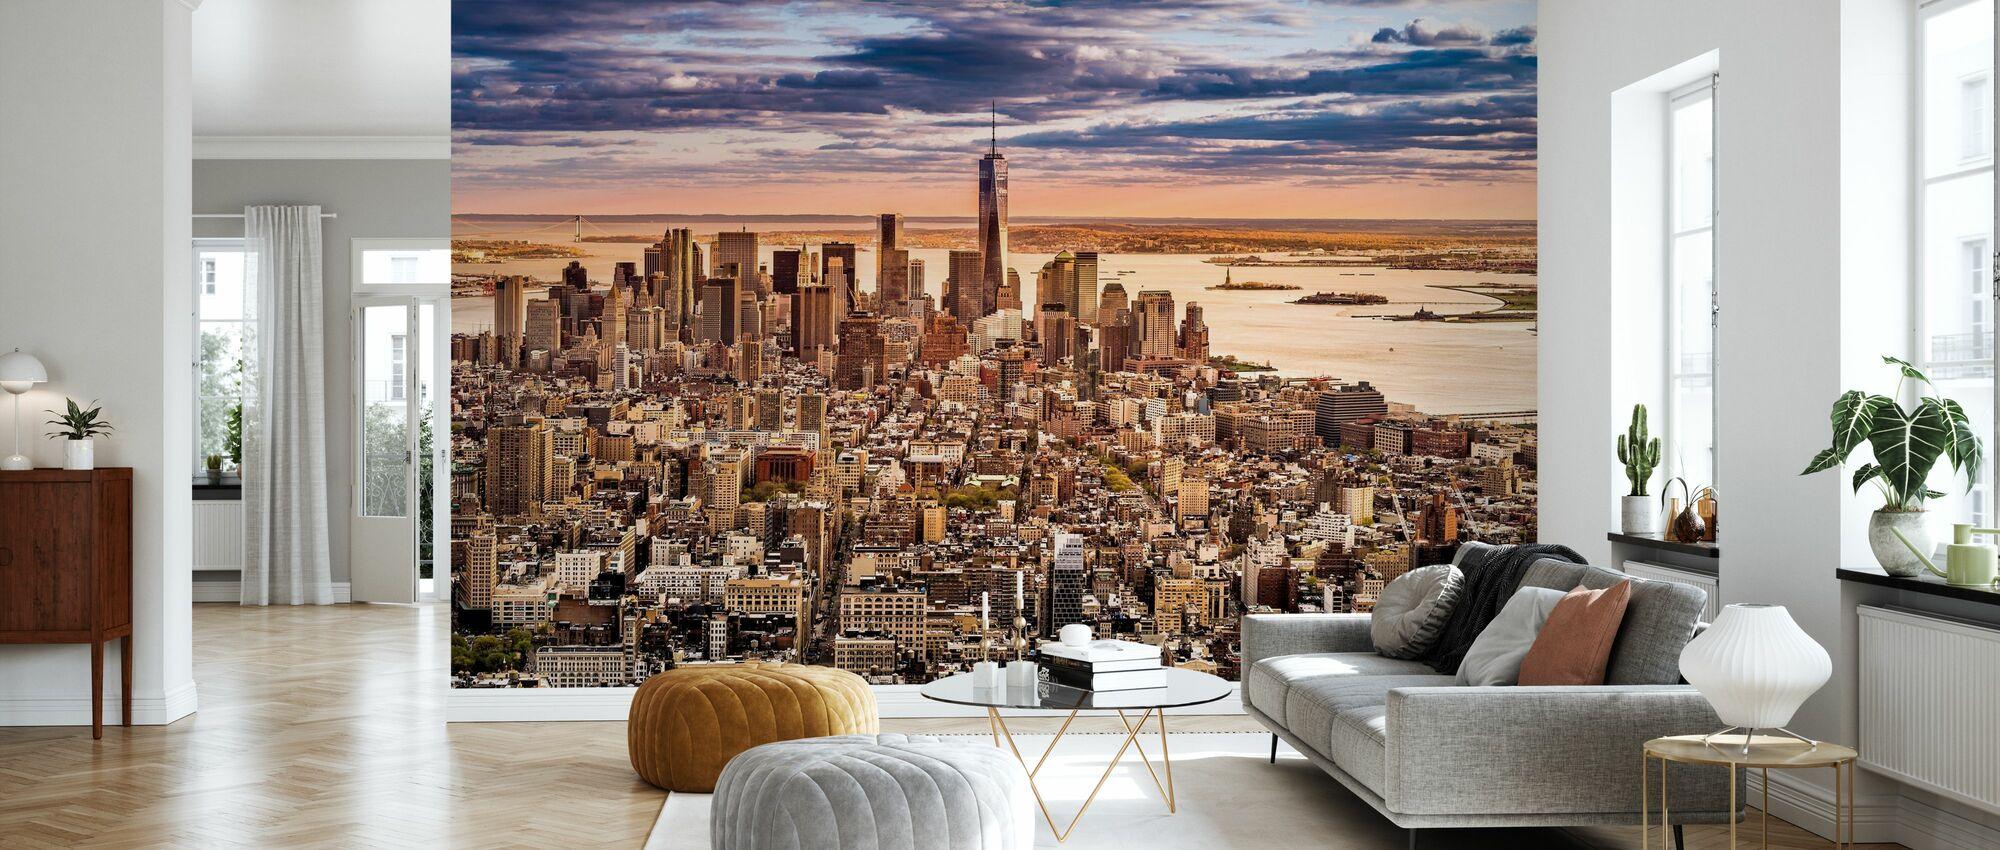 New York Panorama before Sunset - Wallpaper - Living Room